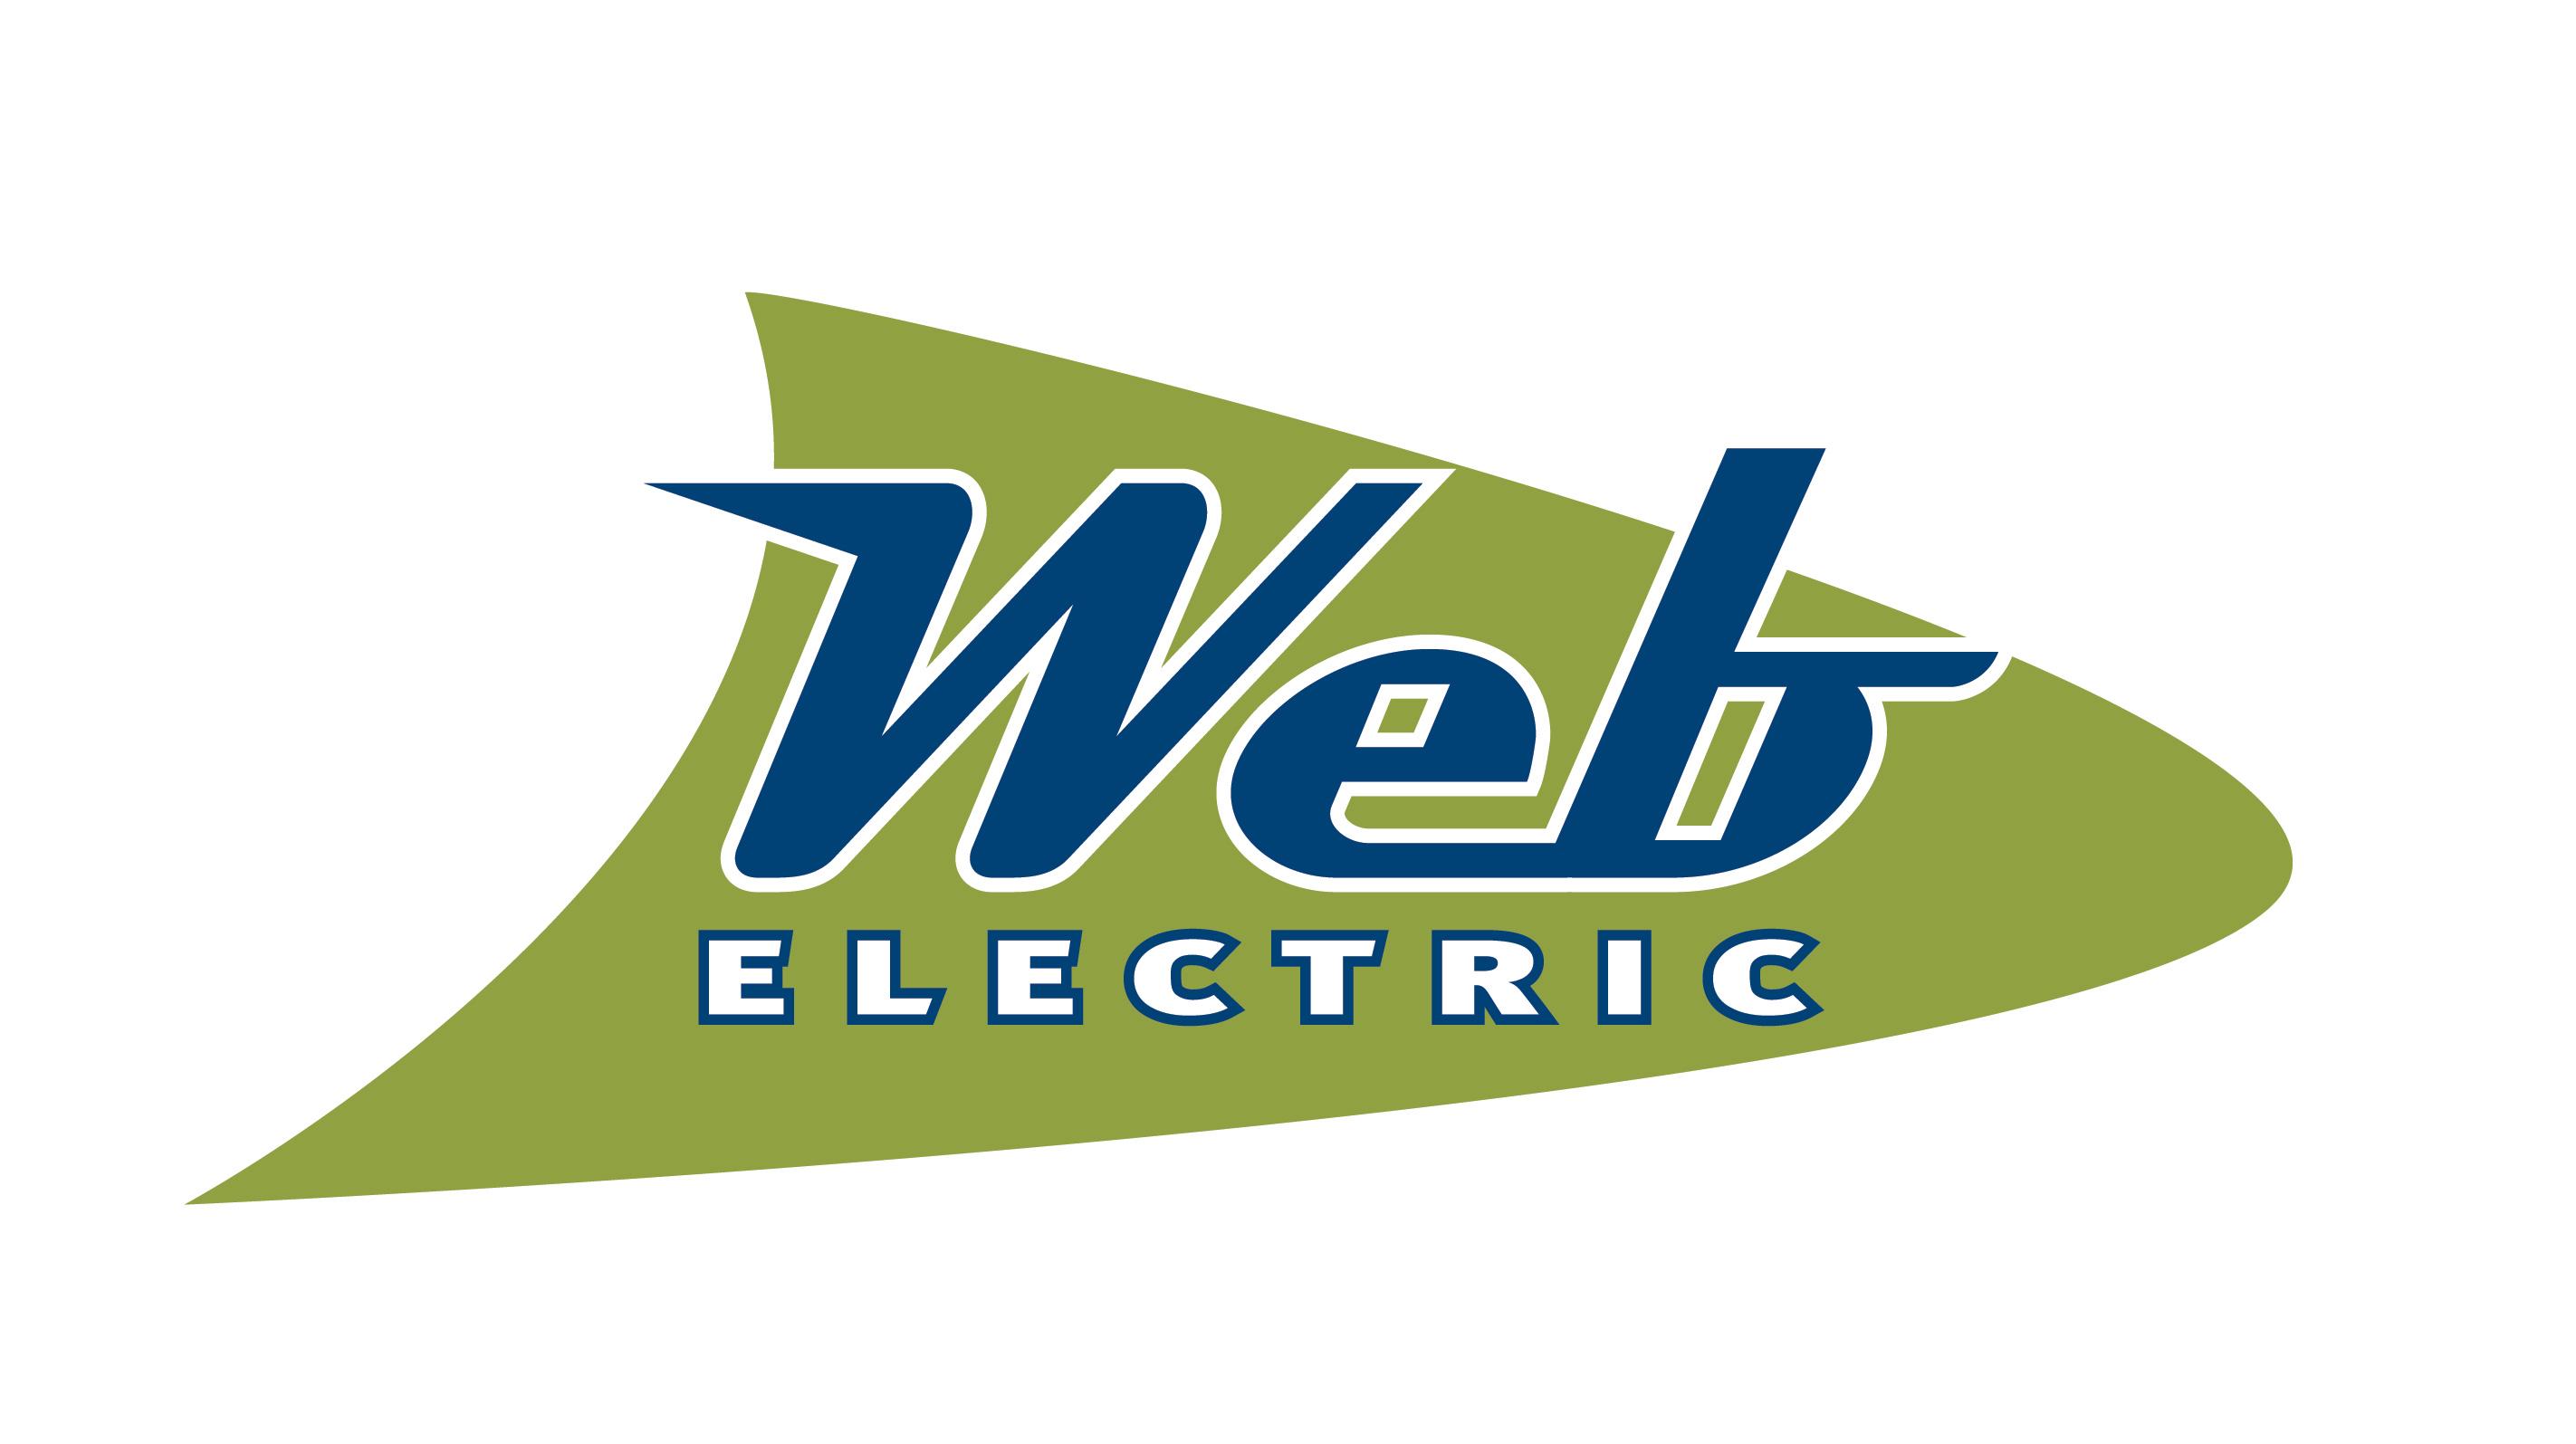 Web Electric